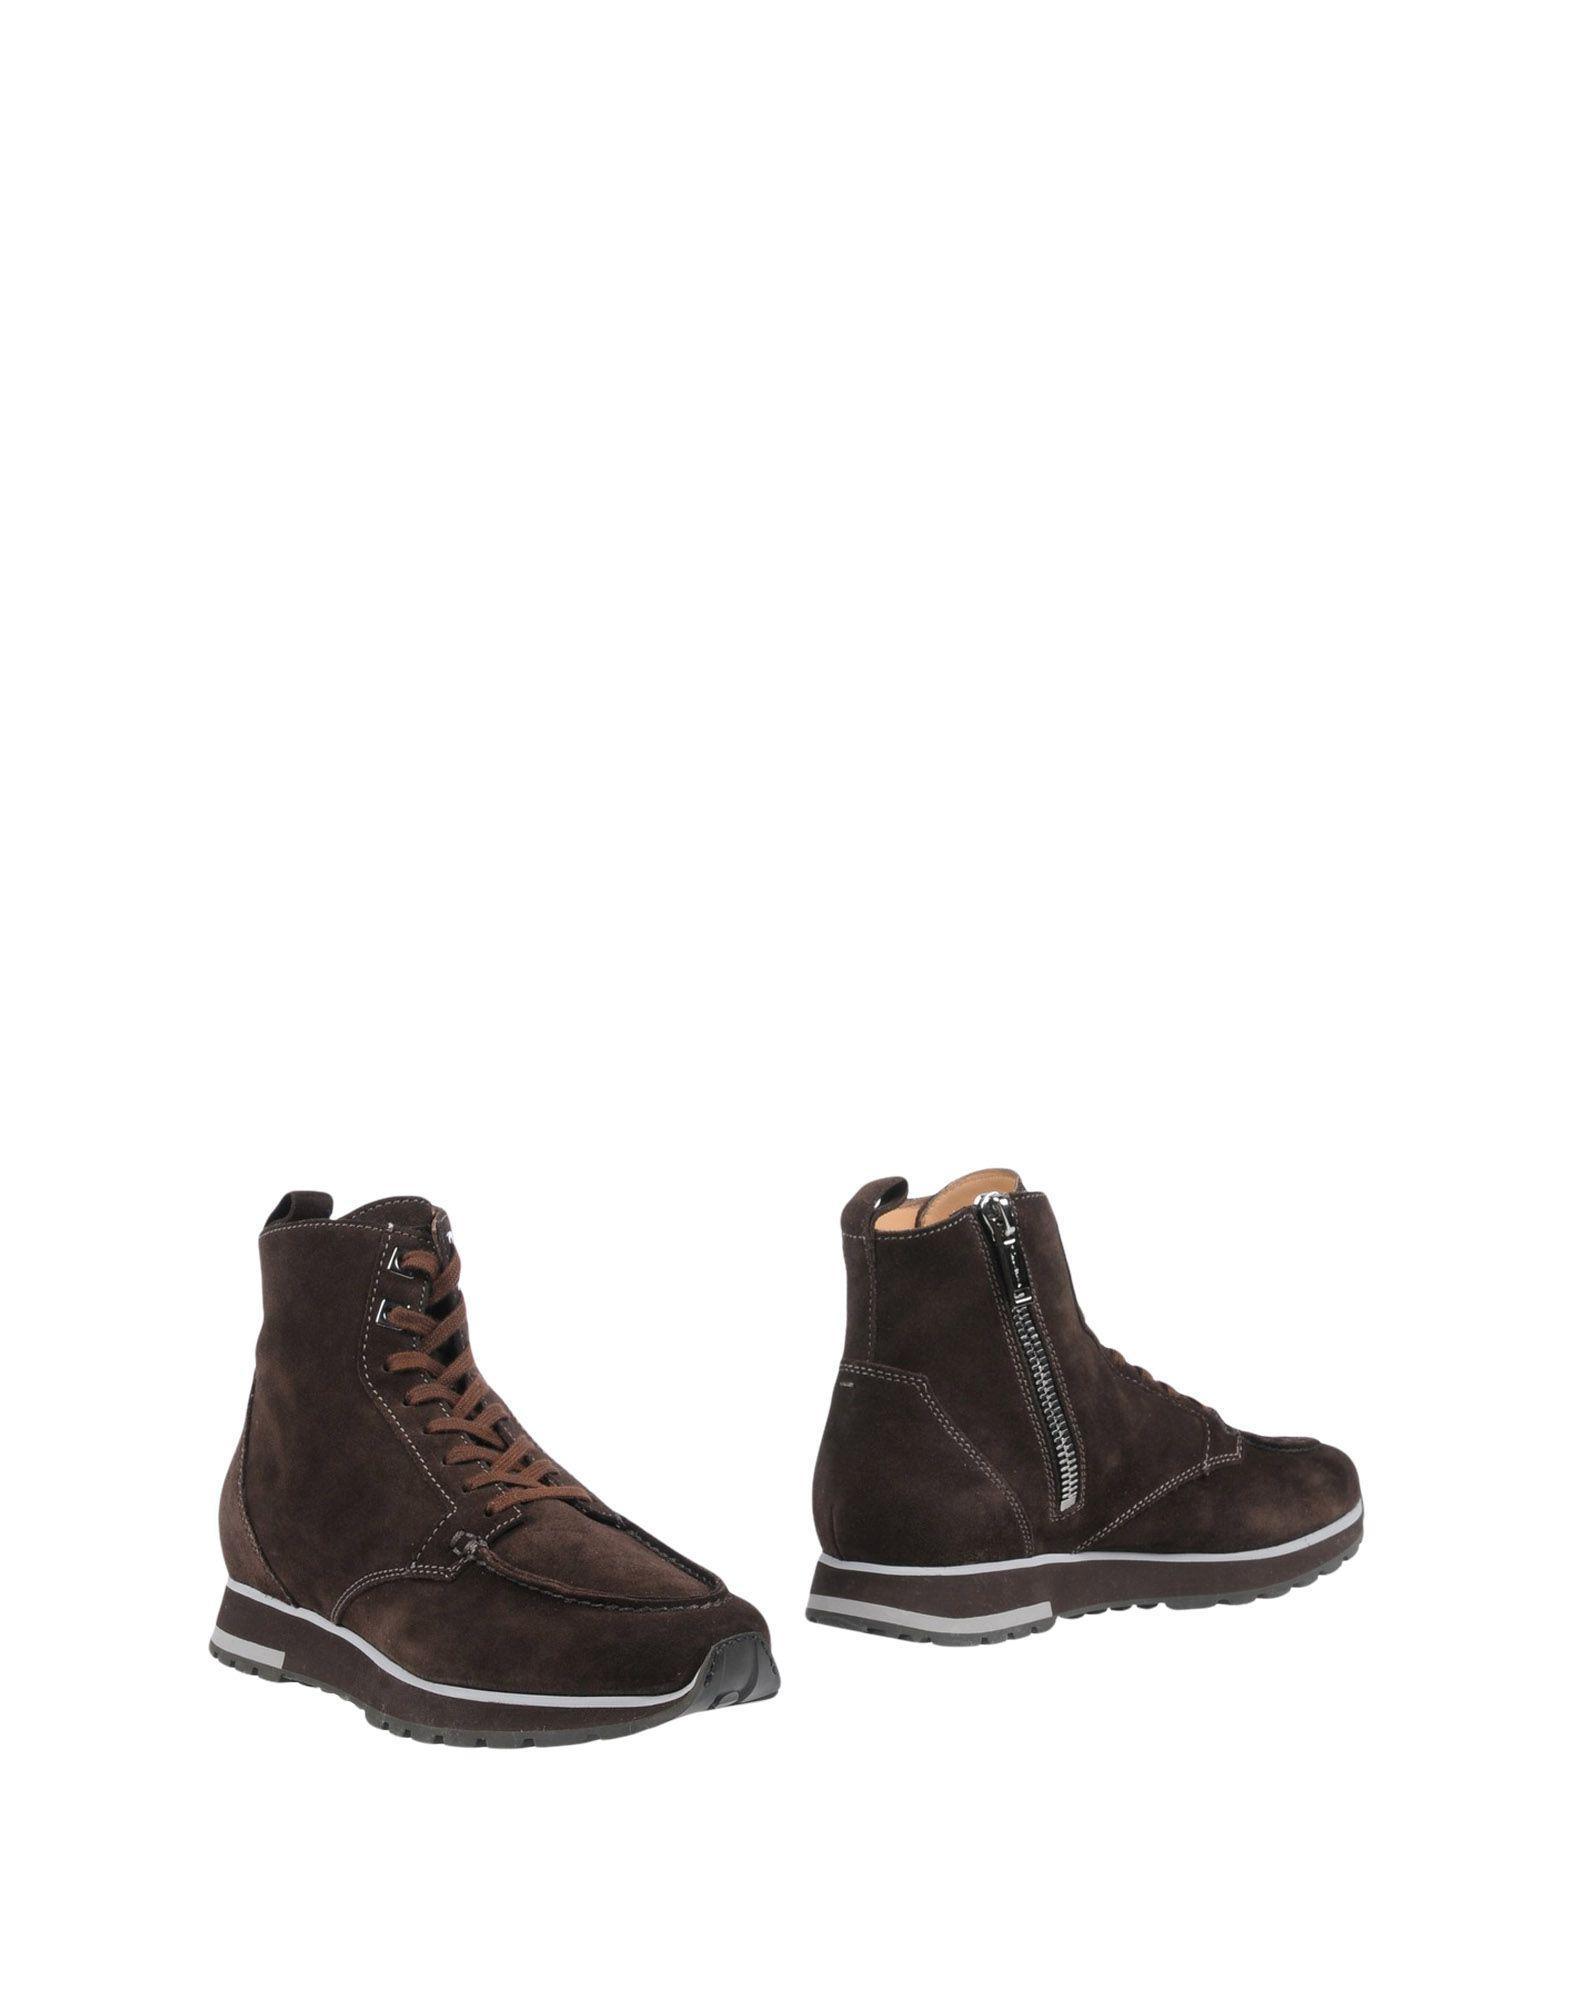 Santoni Ankle Boots In Dark Brown